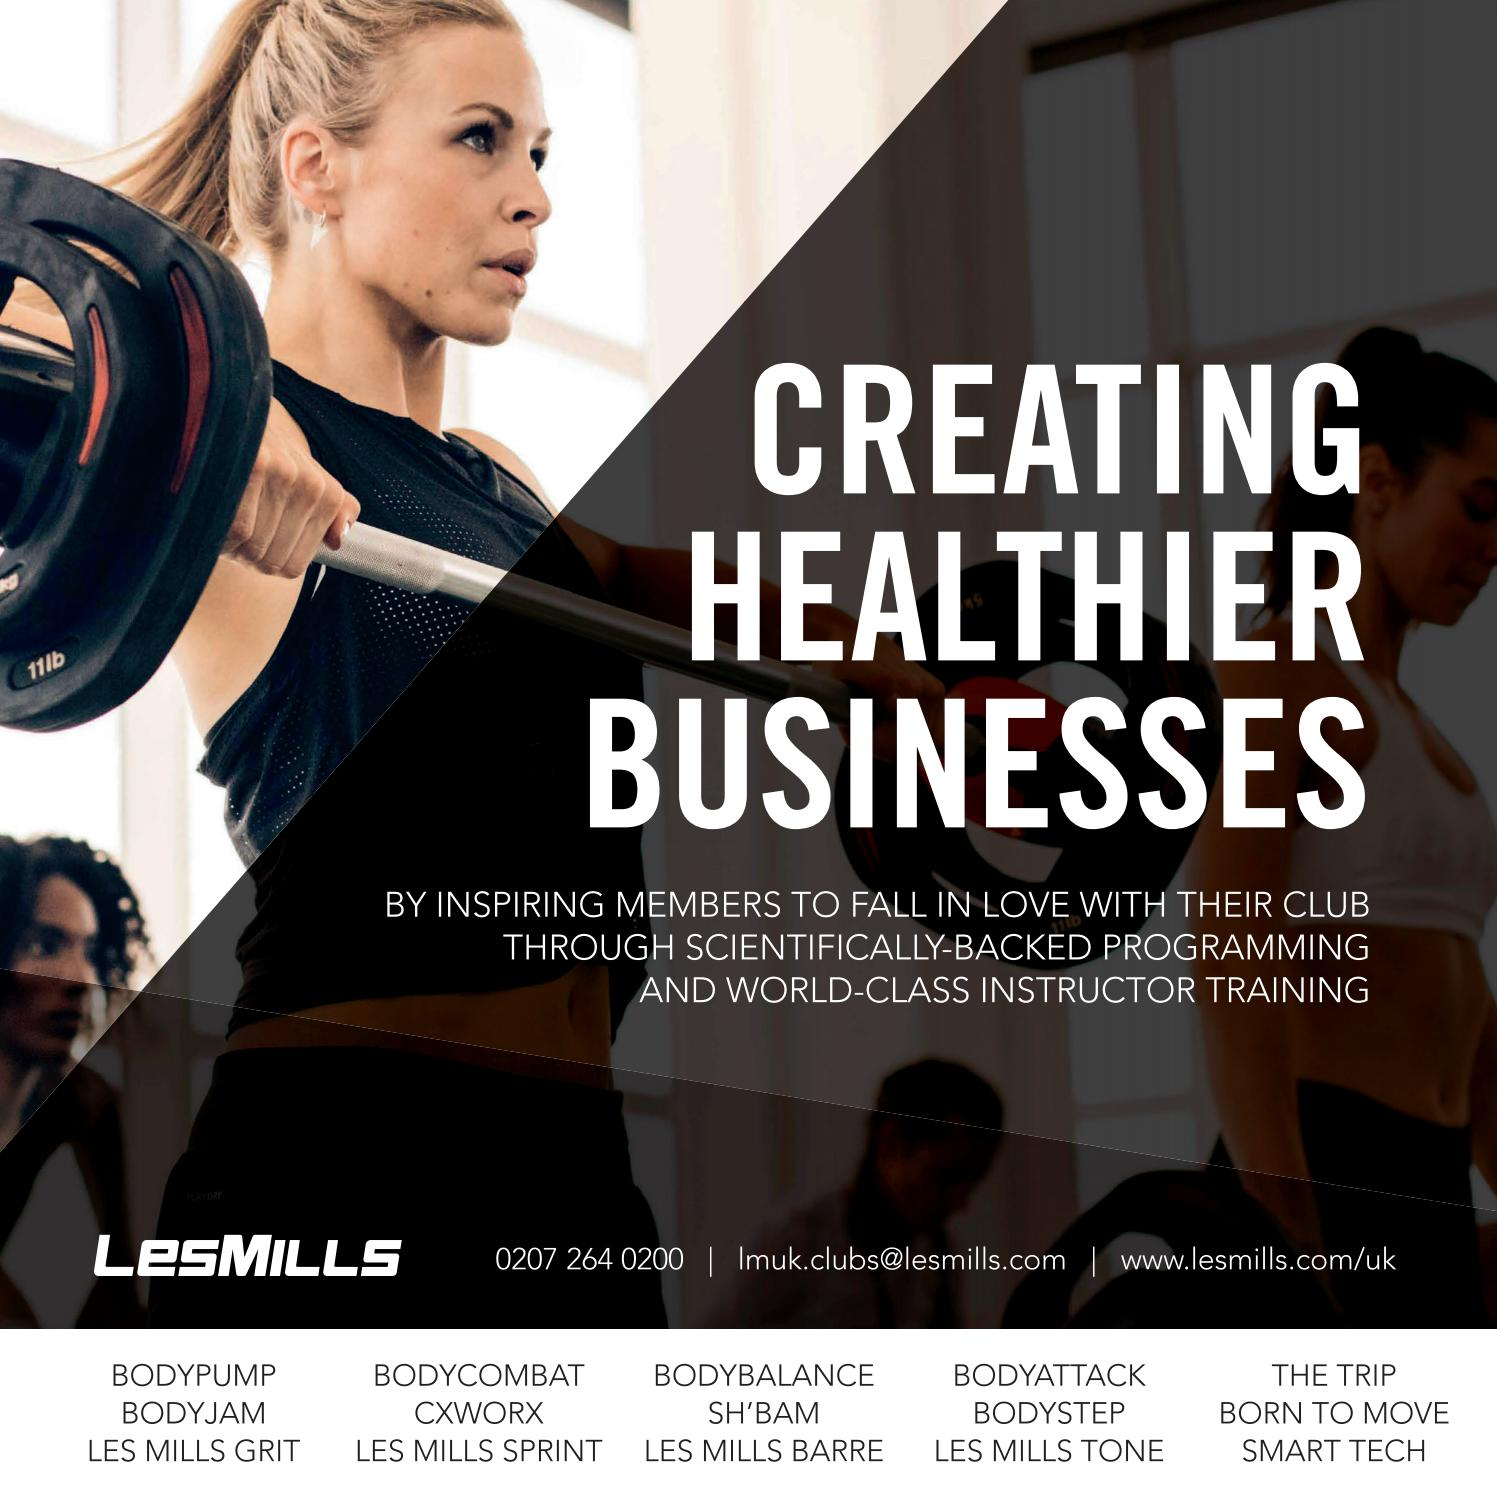 HCM Handbook_2019 by Leisure Media - issuu